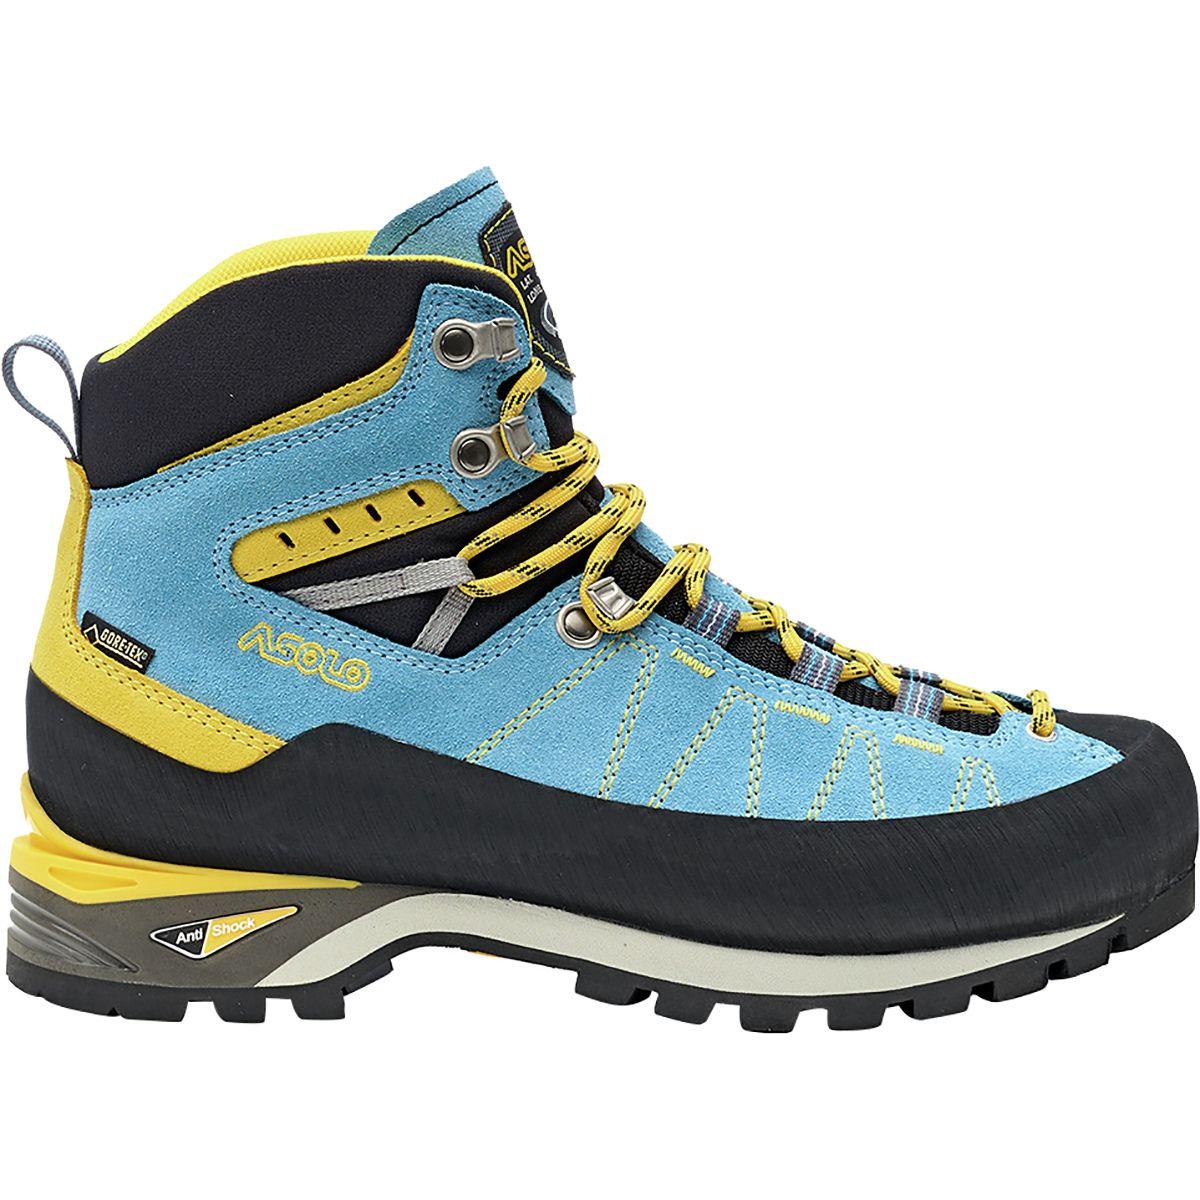 photo: Asolo Women's Piz GV mountaineering boot